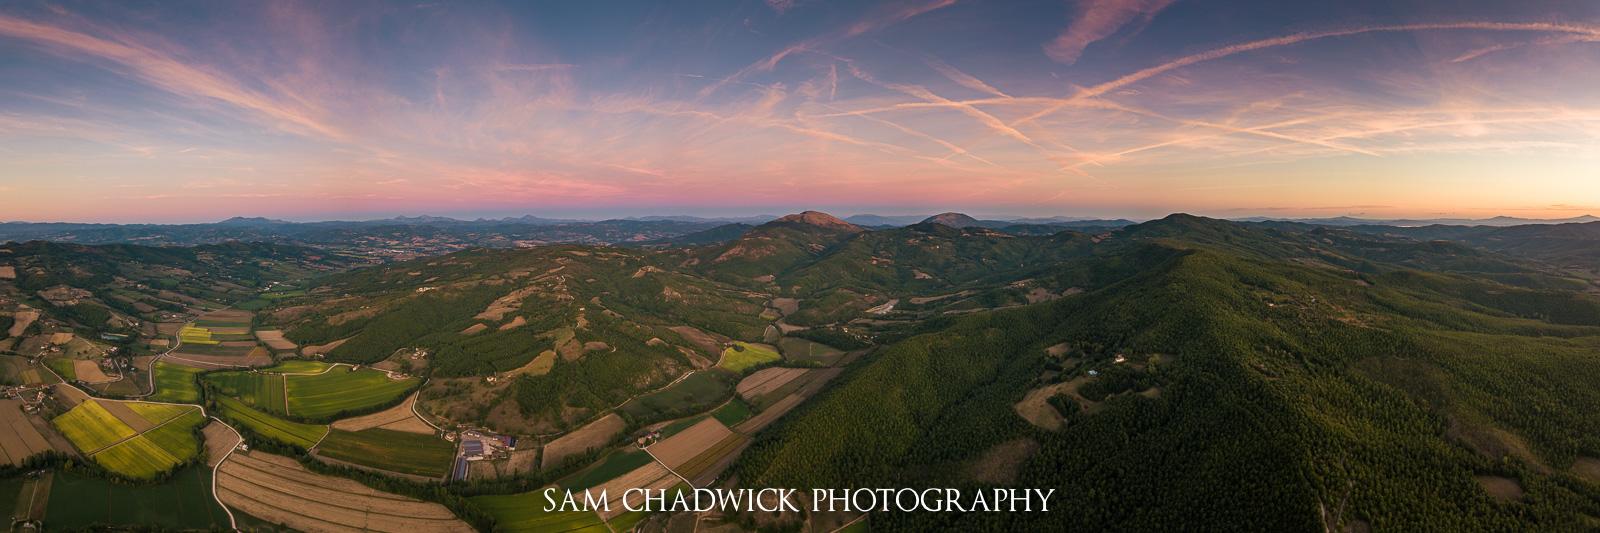 Sunset over Monte Corona